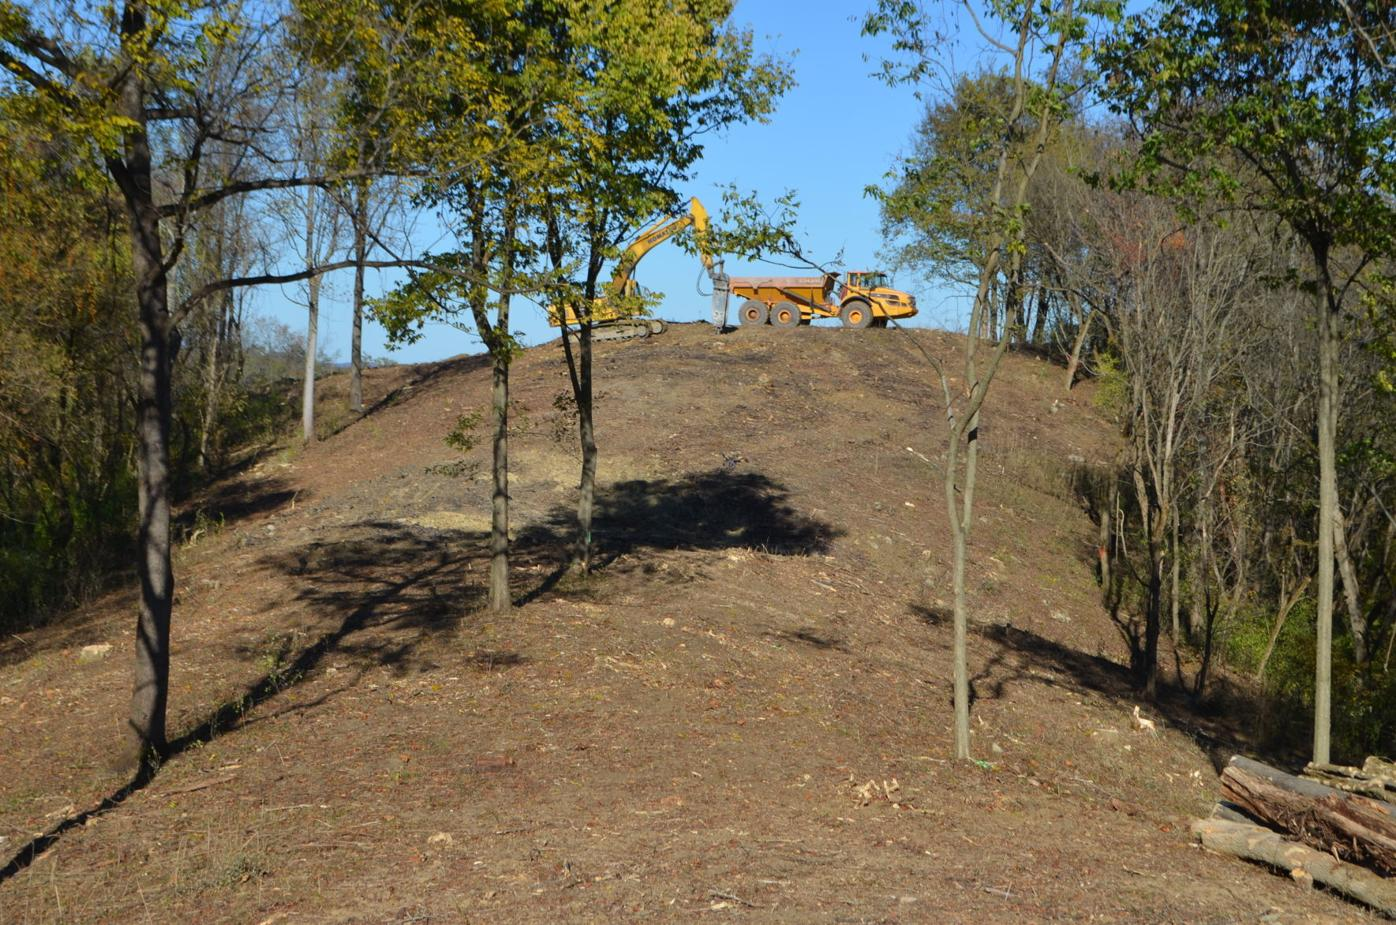 Phase 3 work at I-79 park